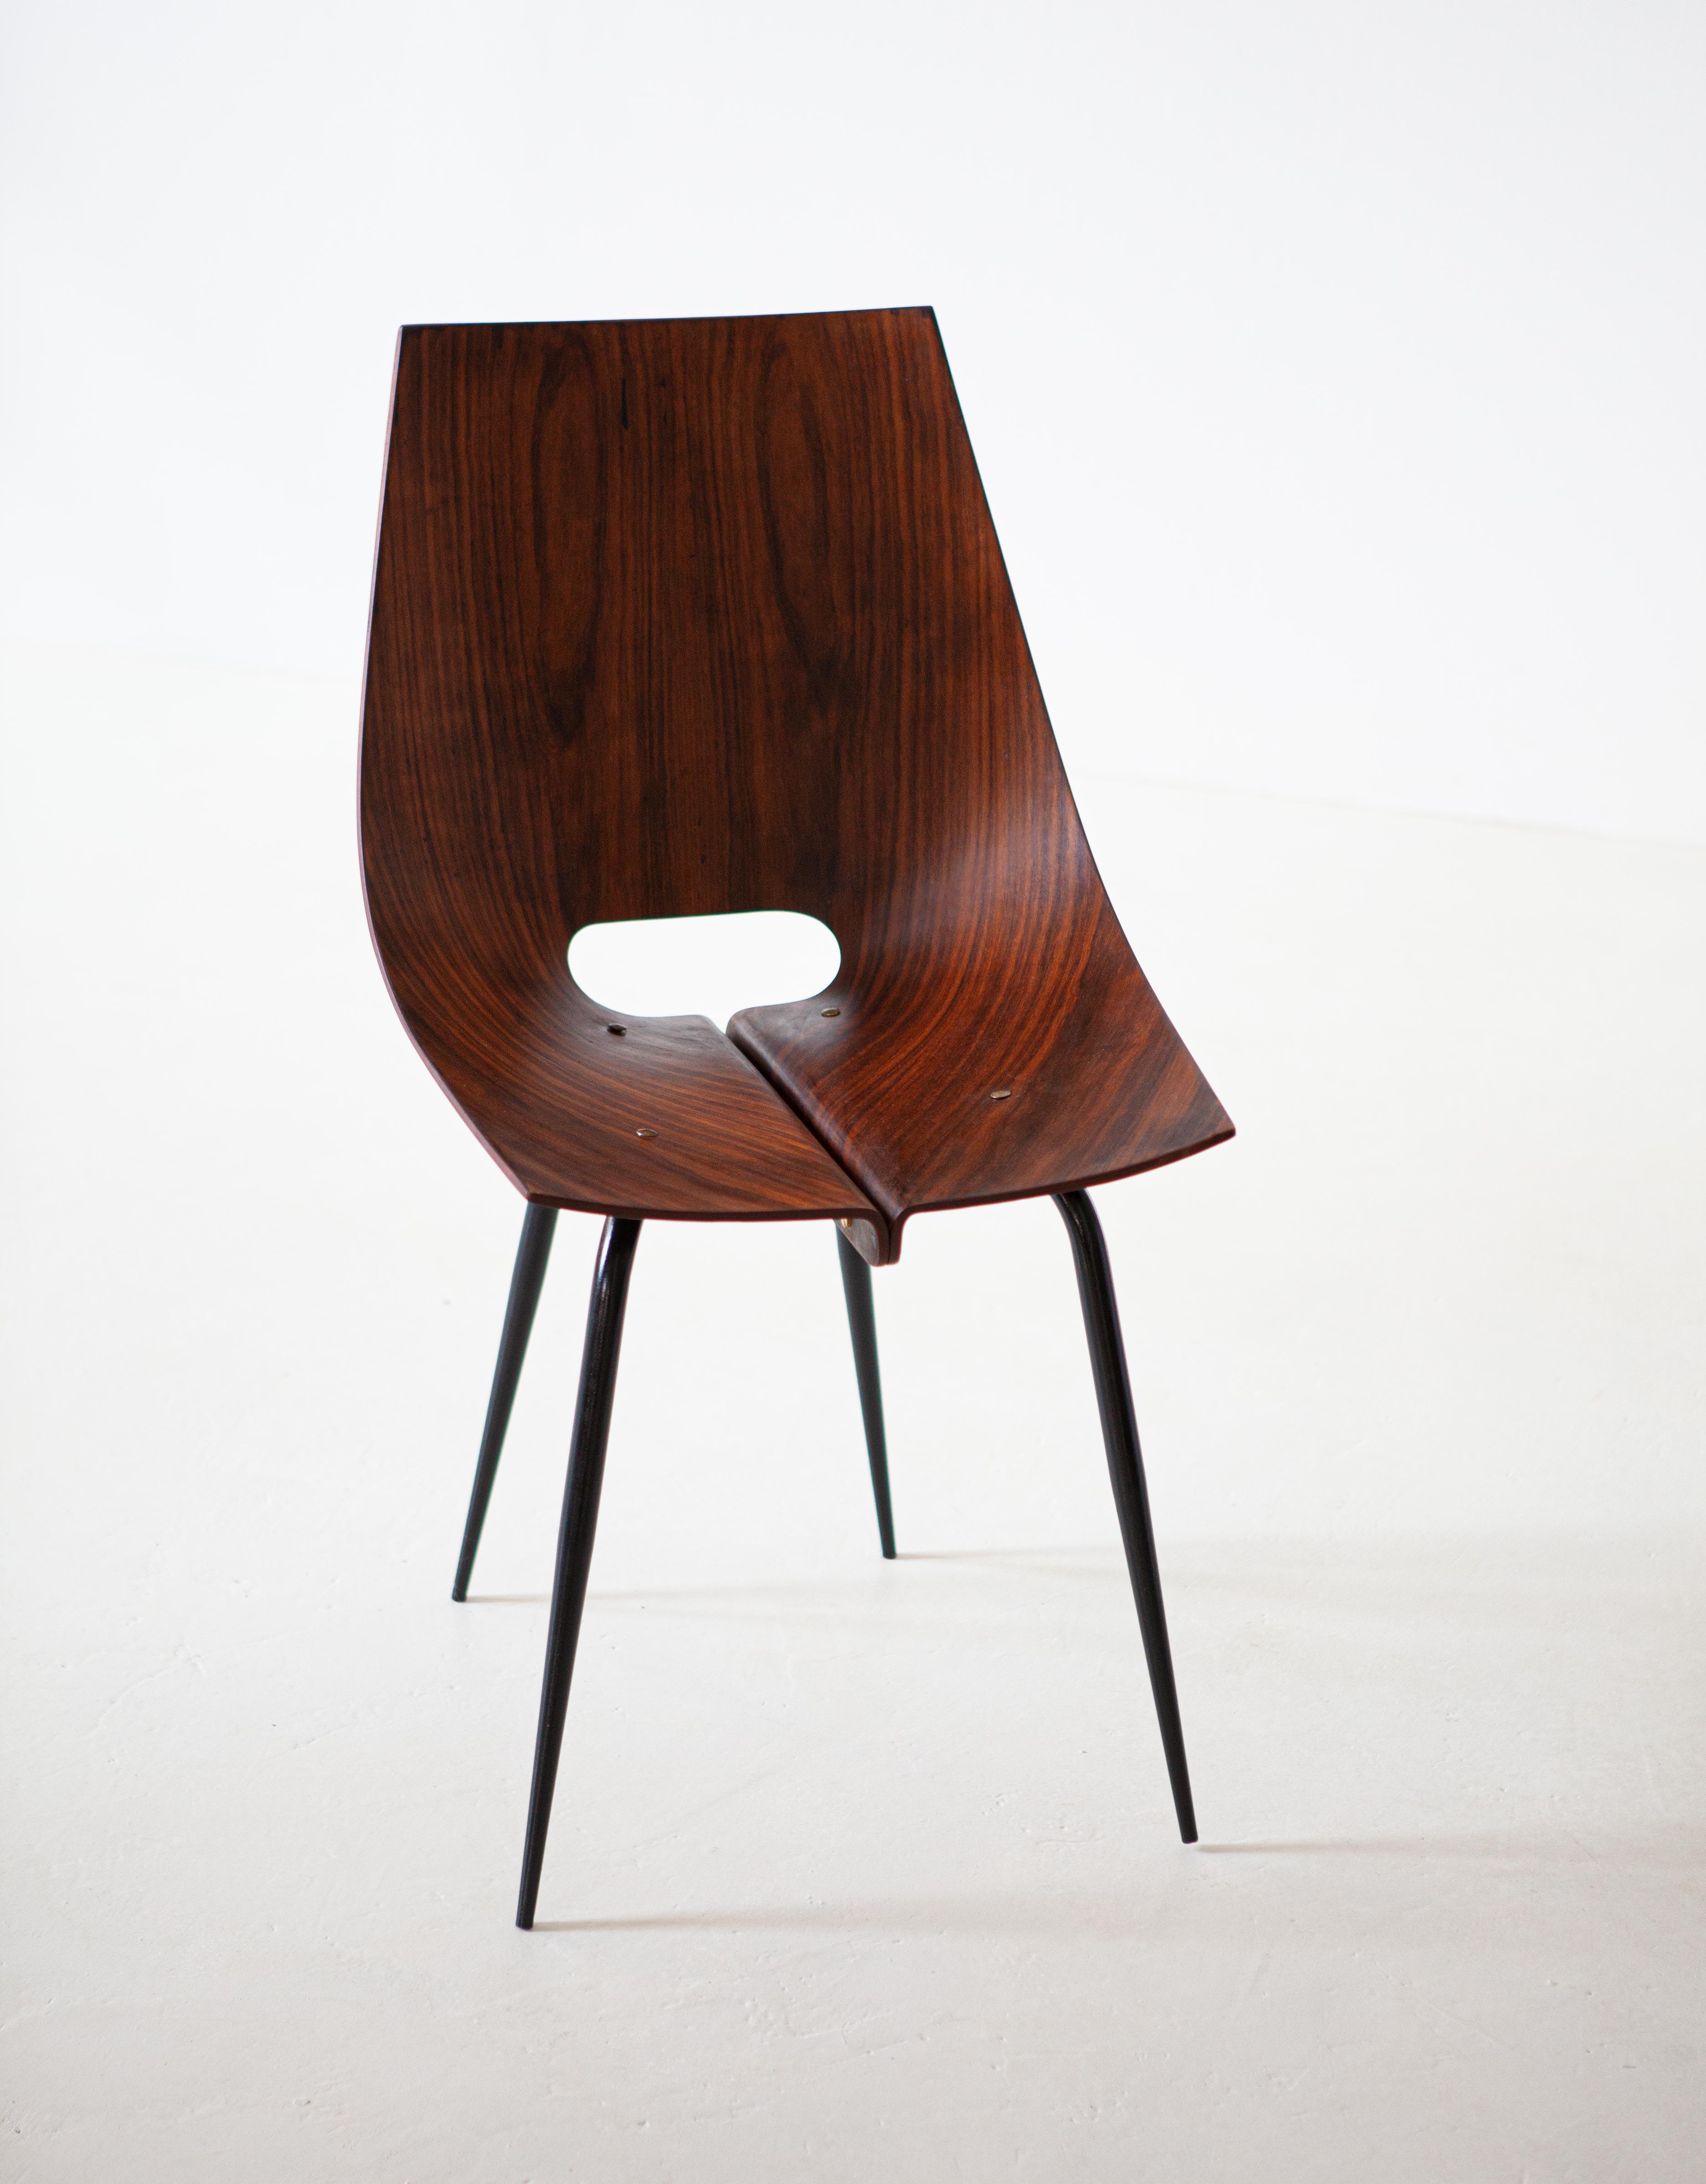 1950s-modern-curved-rosewood-chair-by-societa-compensati-curvati-4-se312